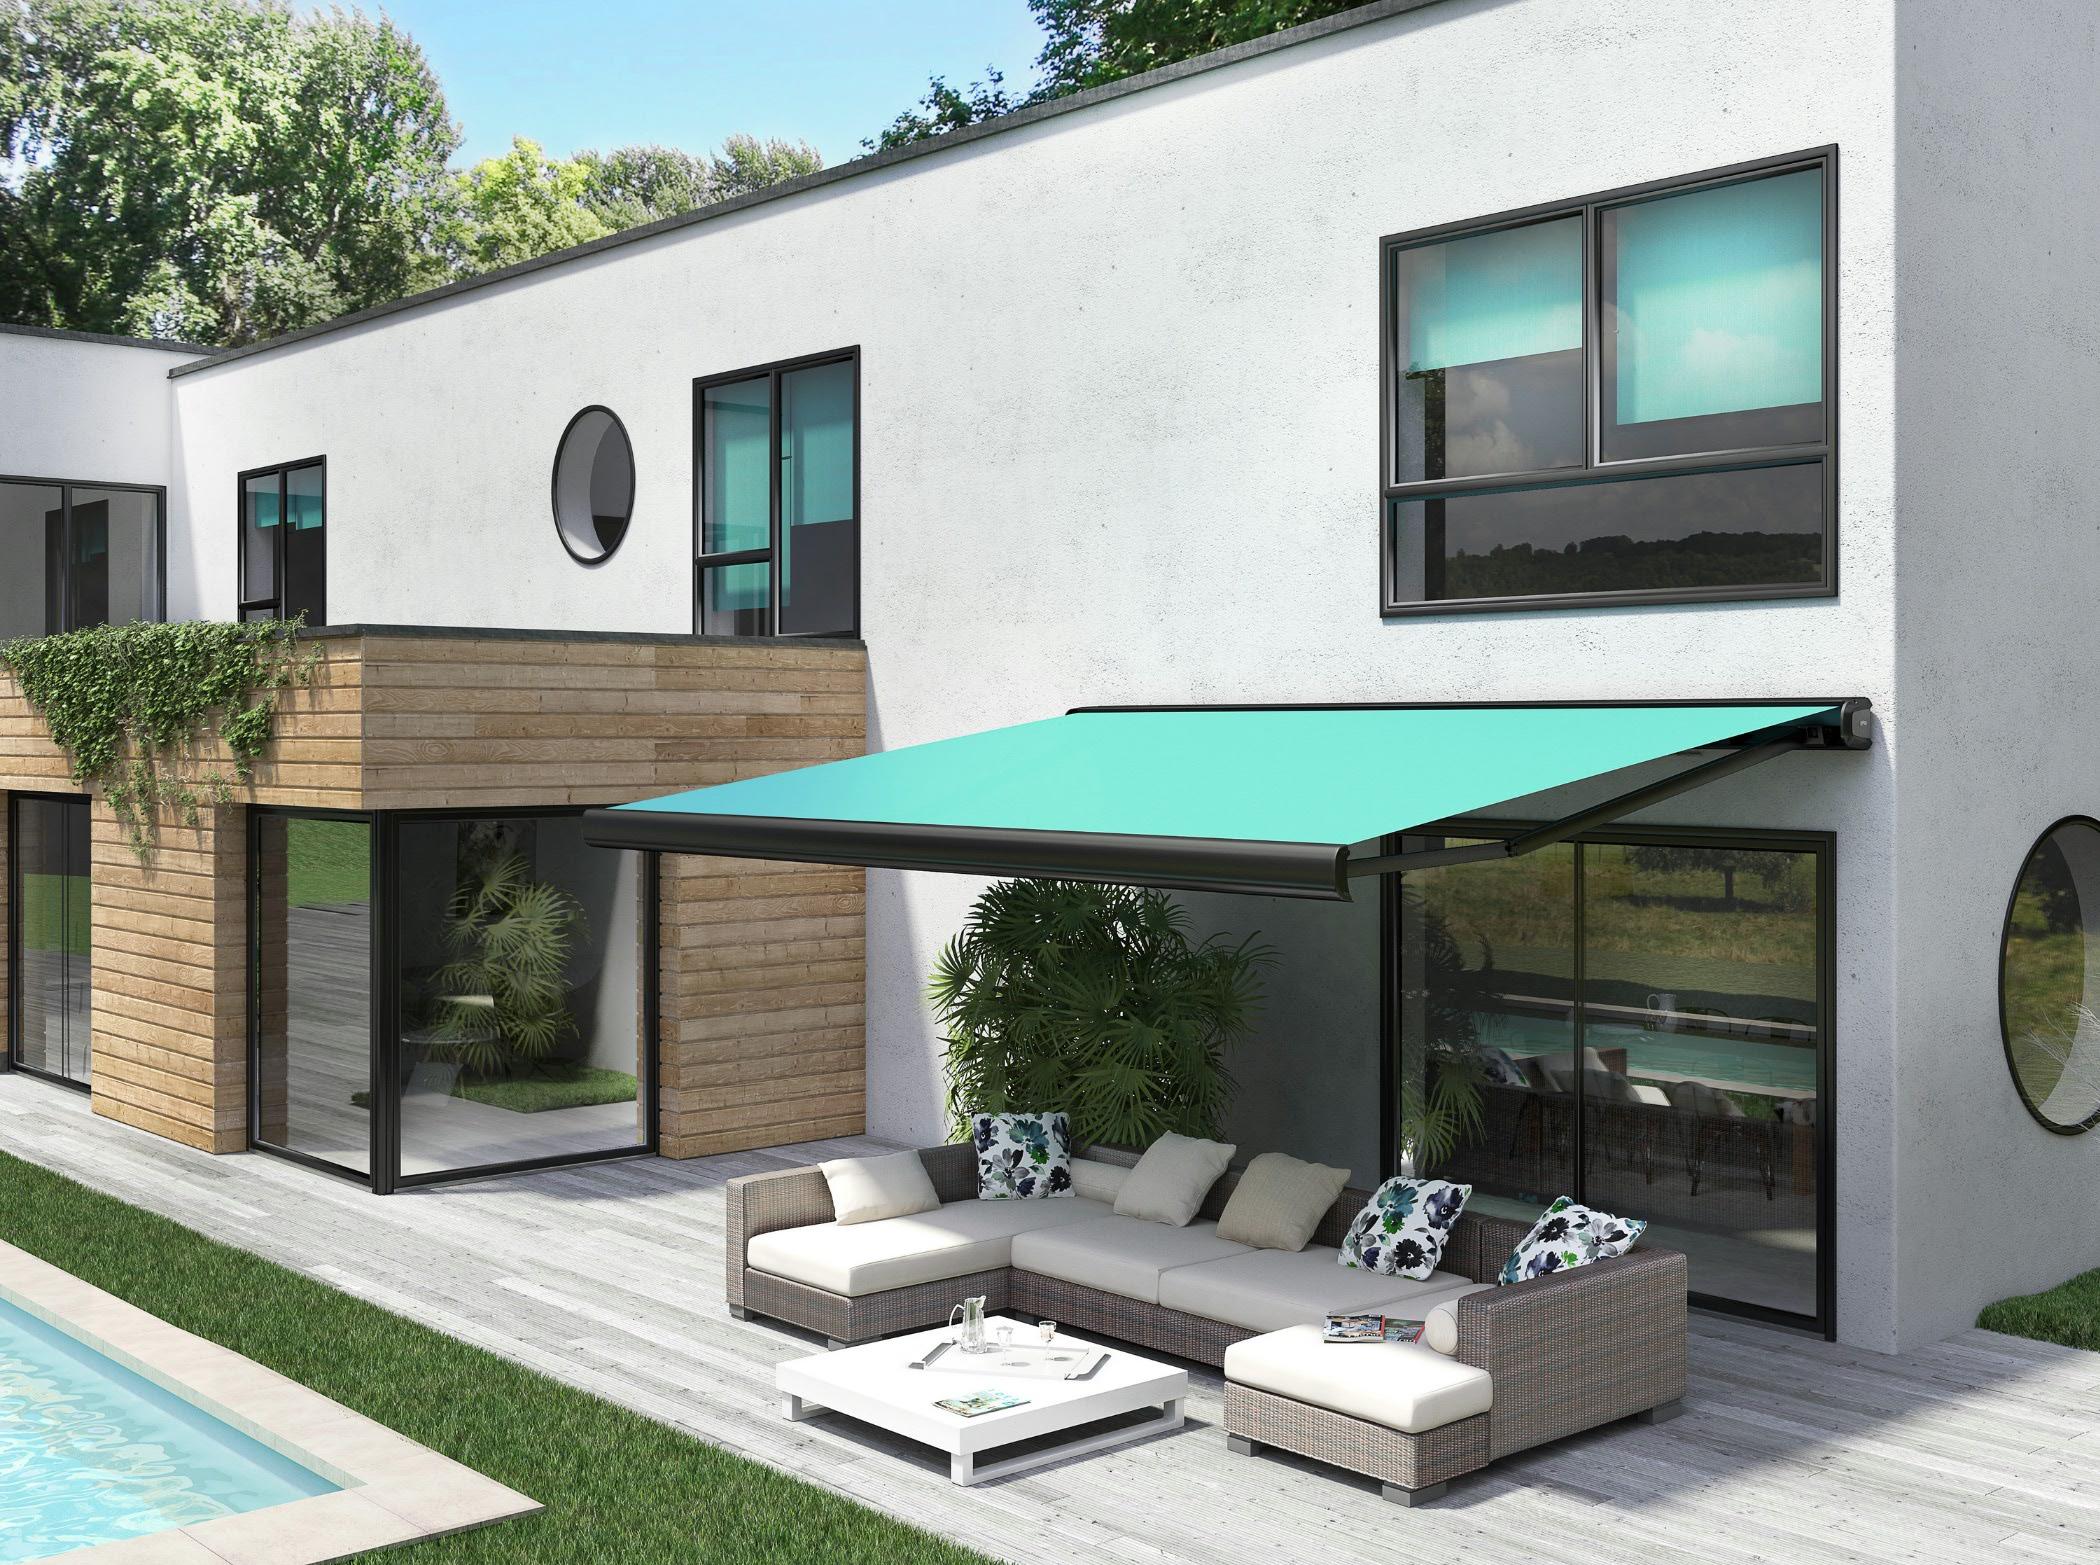 amenagement jardin pergola bois. Black Bedroom Furniture Sets. Home Design Ideas